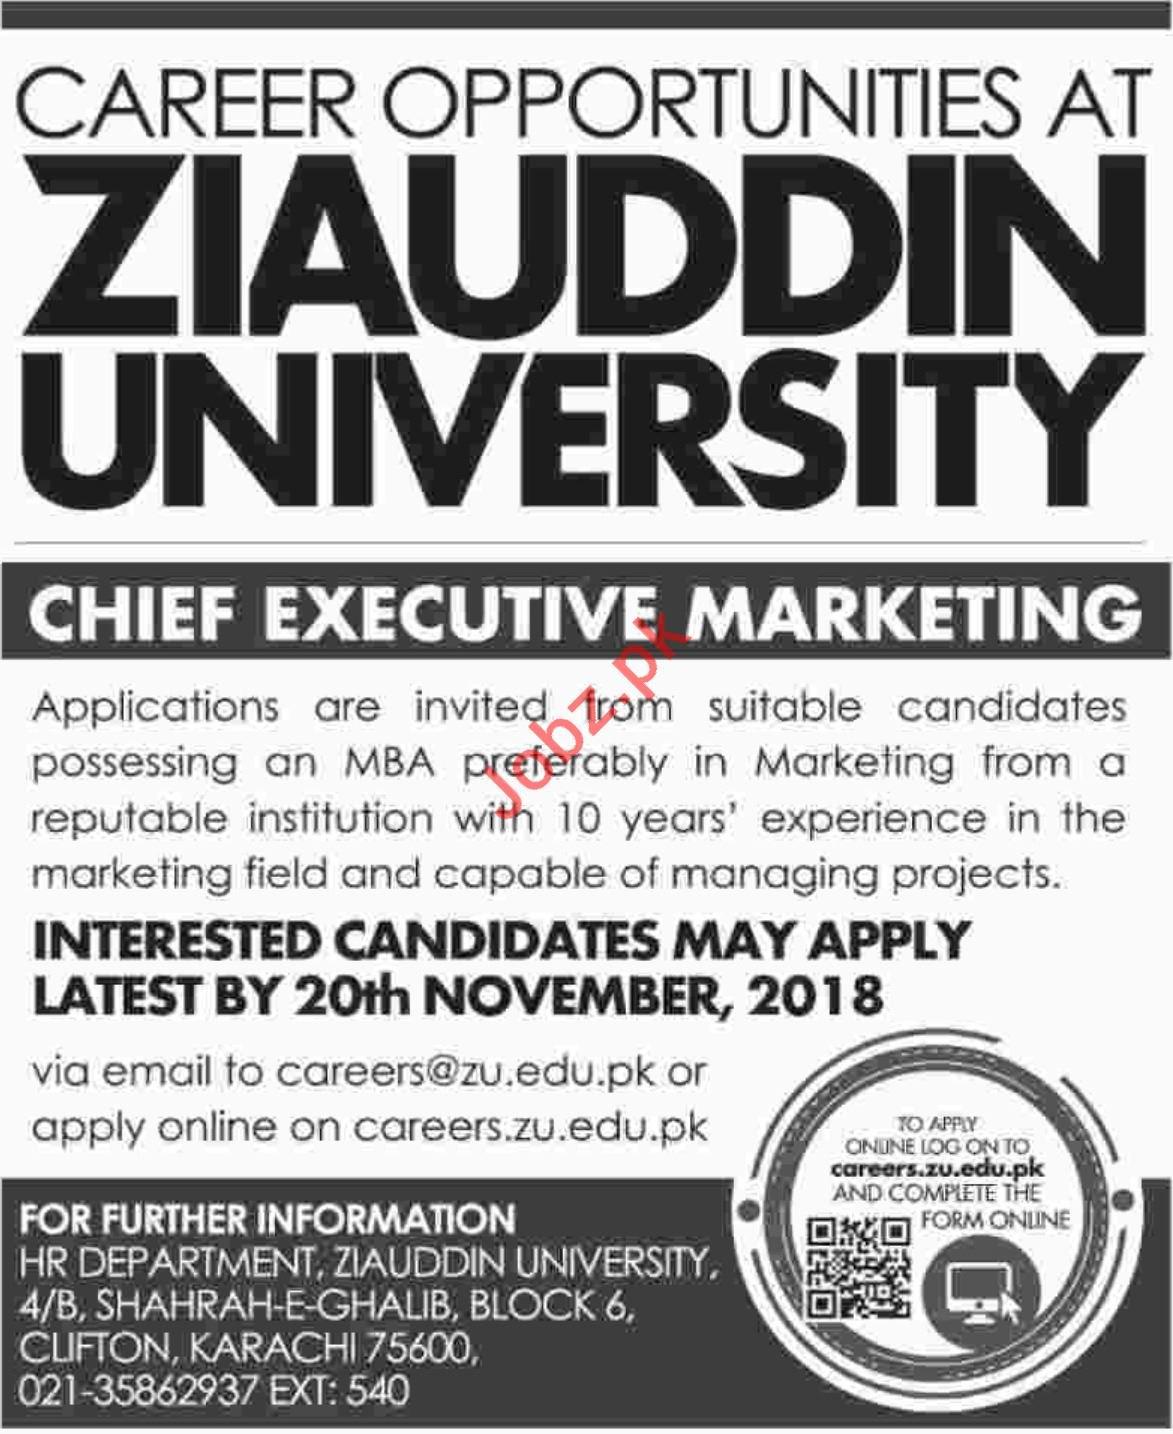 Chief Executive Marketing for Ziauddin University